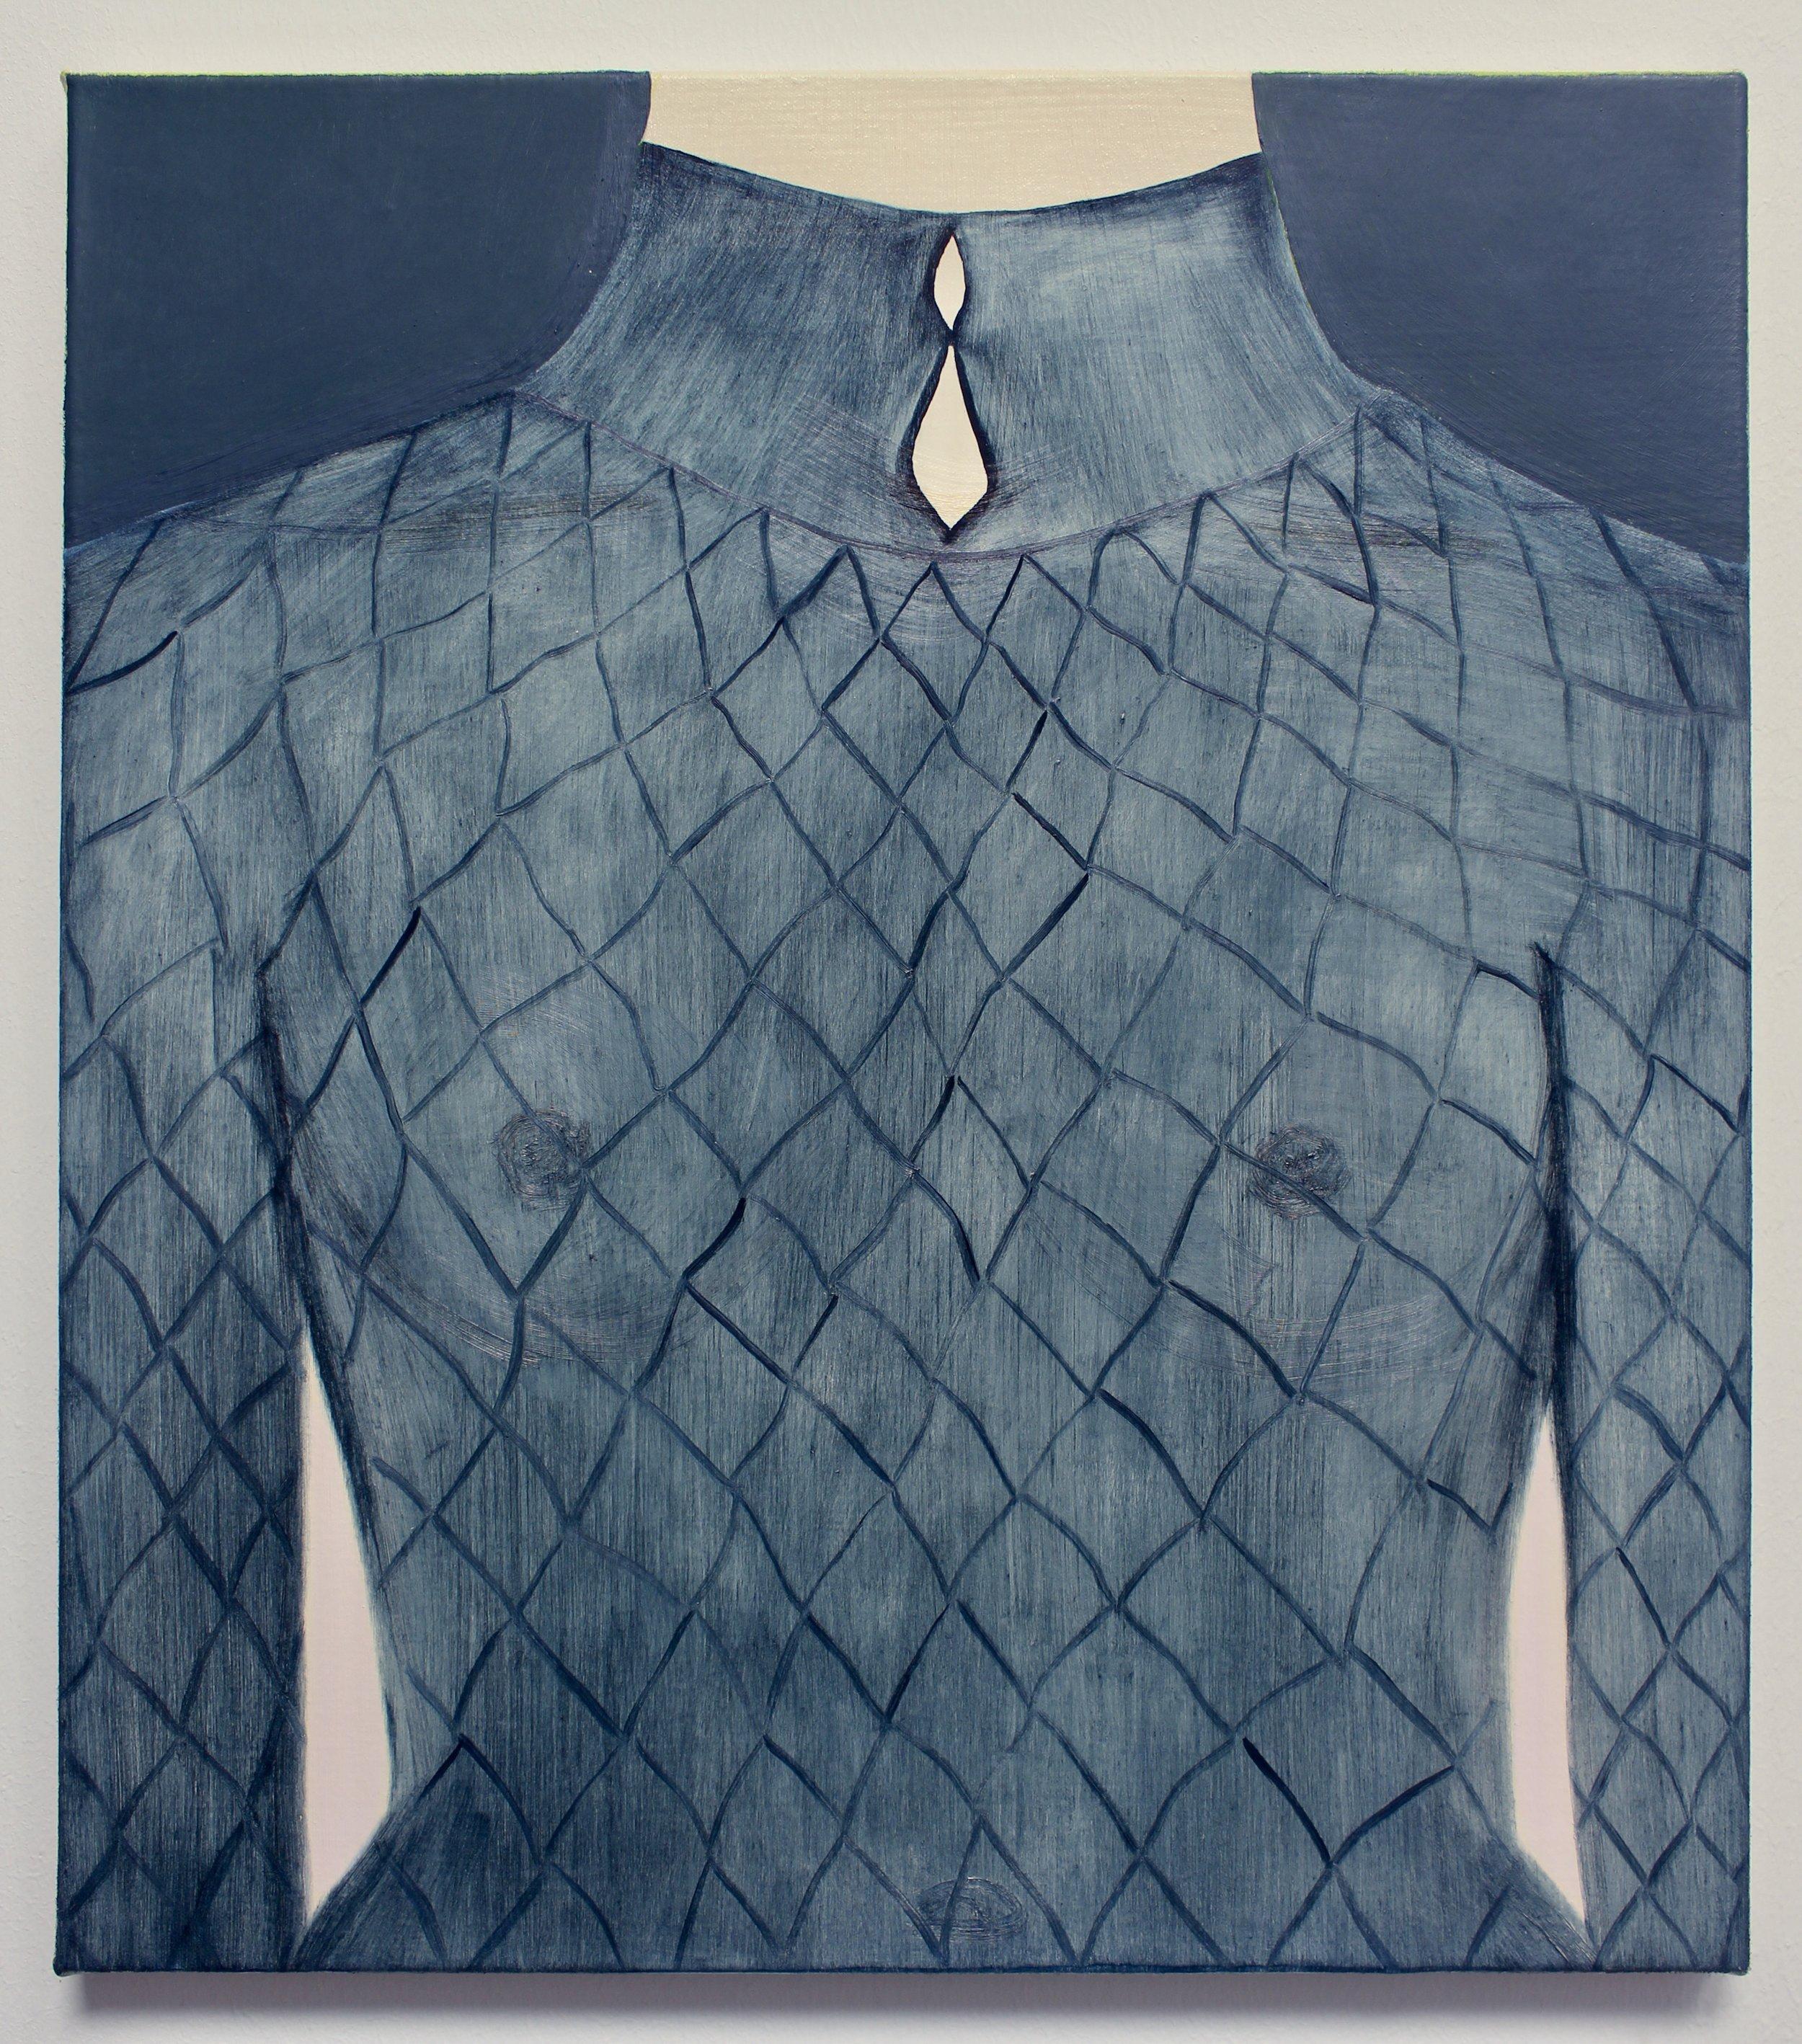 Fishnet , oil on canvas, 46 x 40cm, 2019